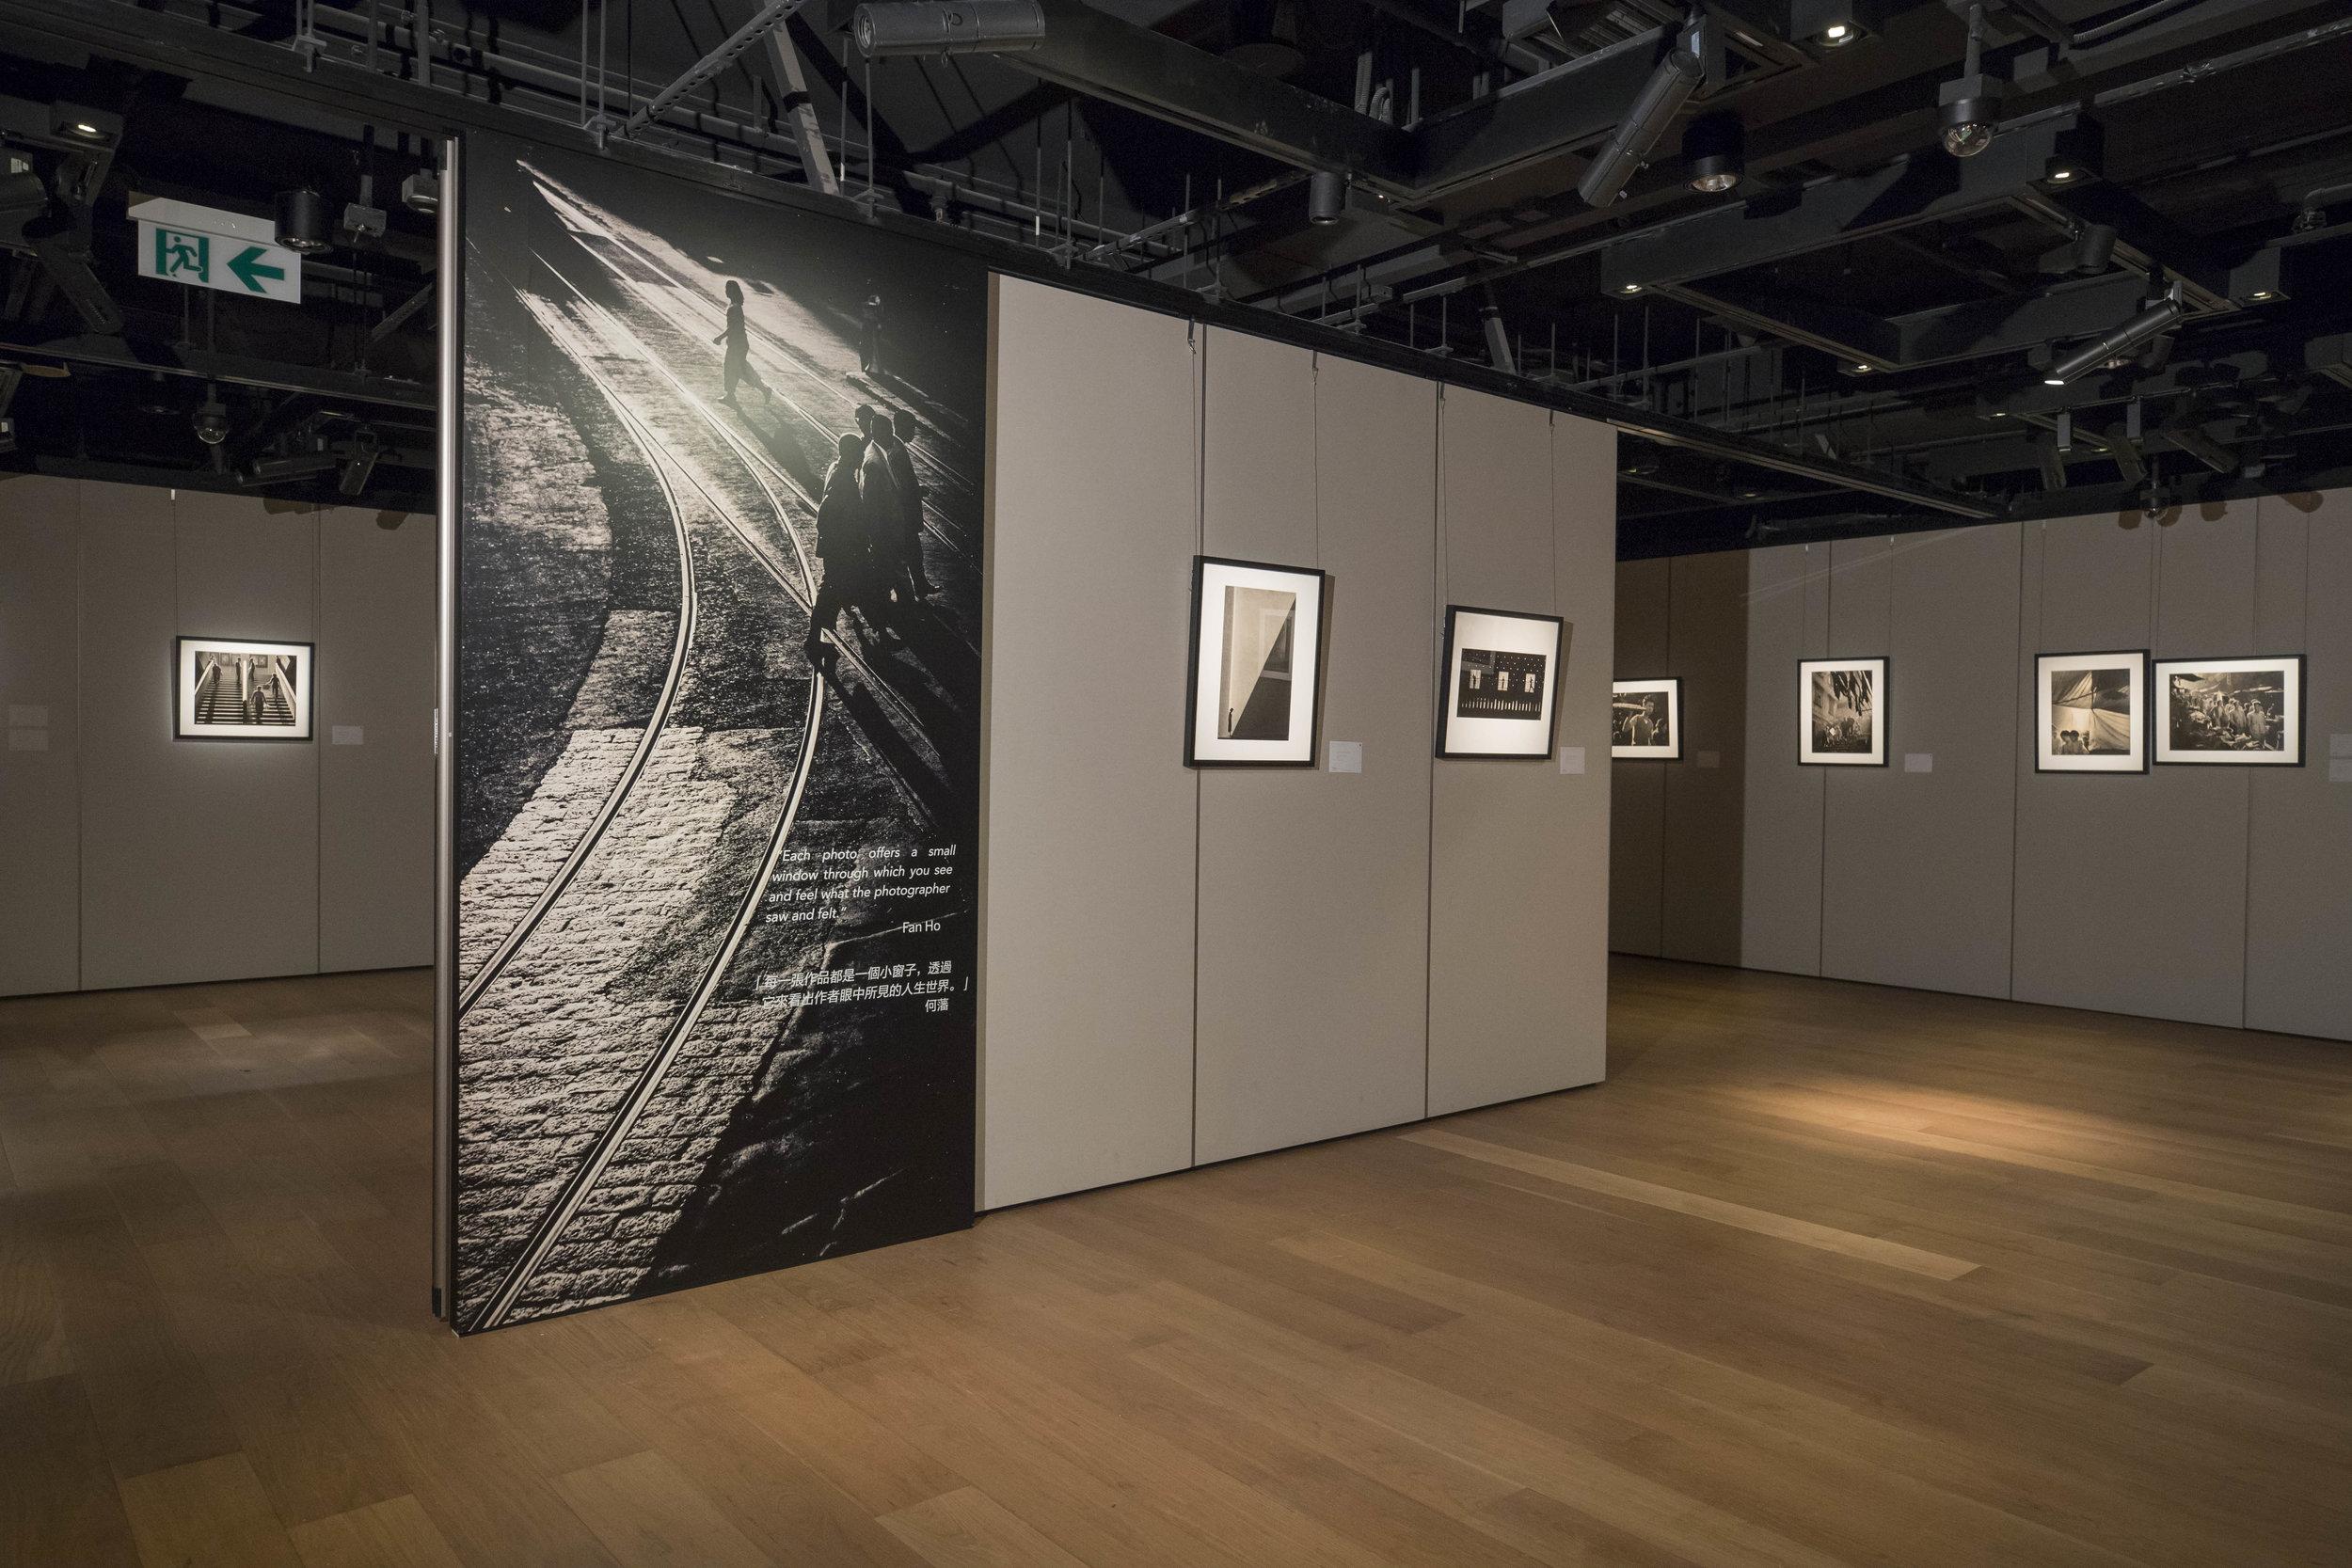 Visual Dialogues, Hong Kong through the Lens of Fan Ho 何藩 : 鏡頭細訴香港光影